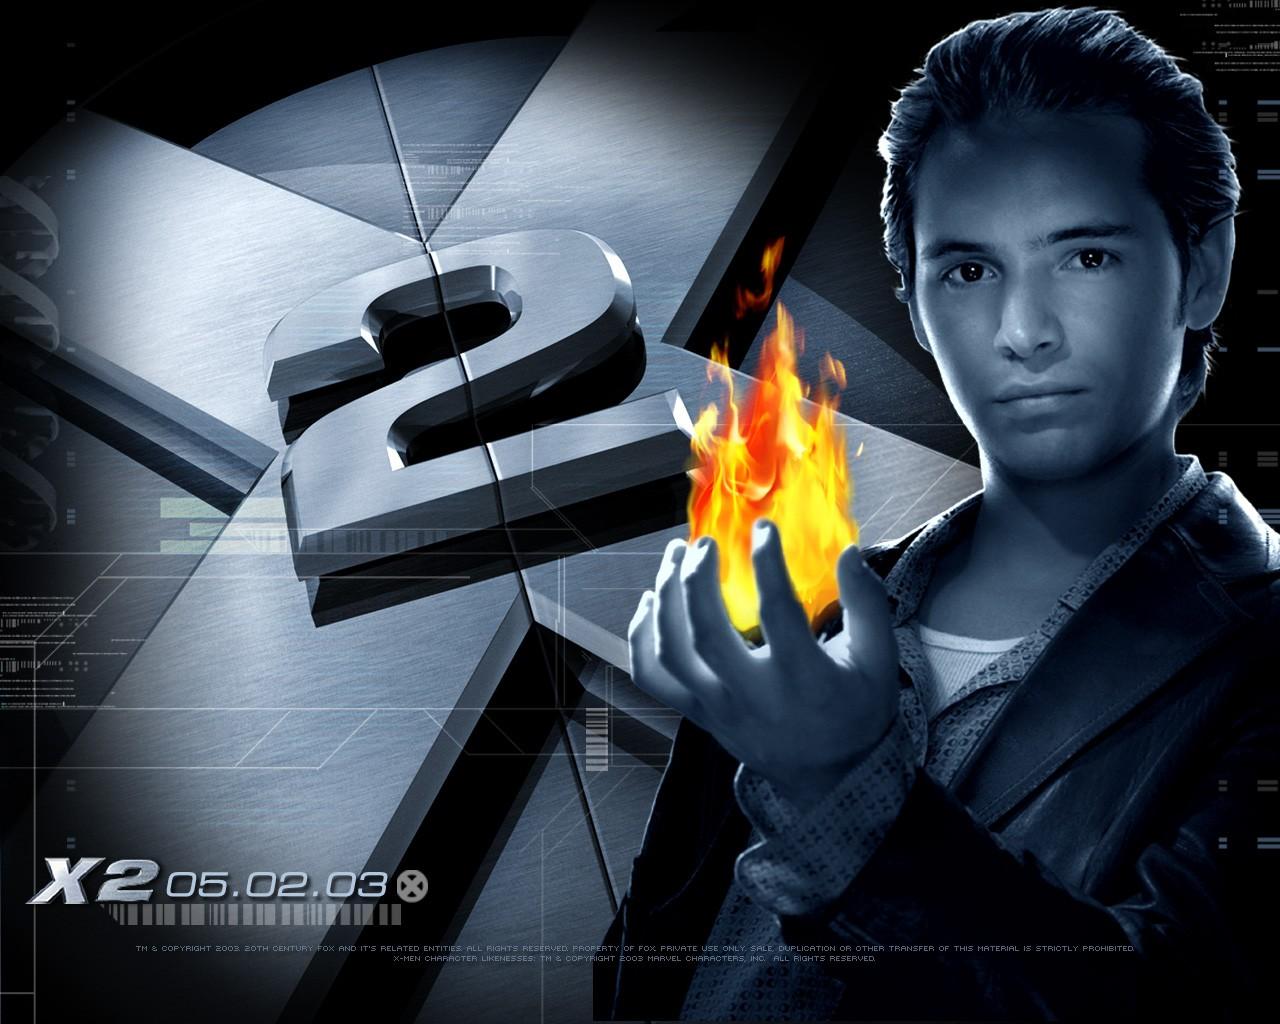 X-men 2: un wallpaper di Aaron Stanford